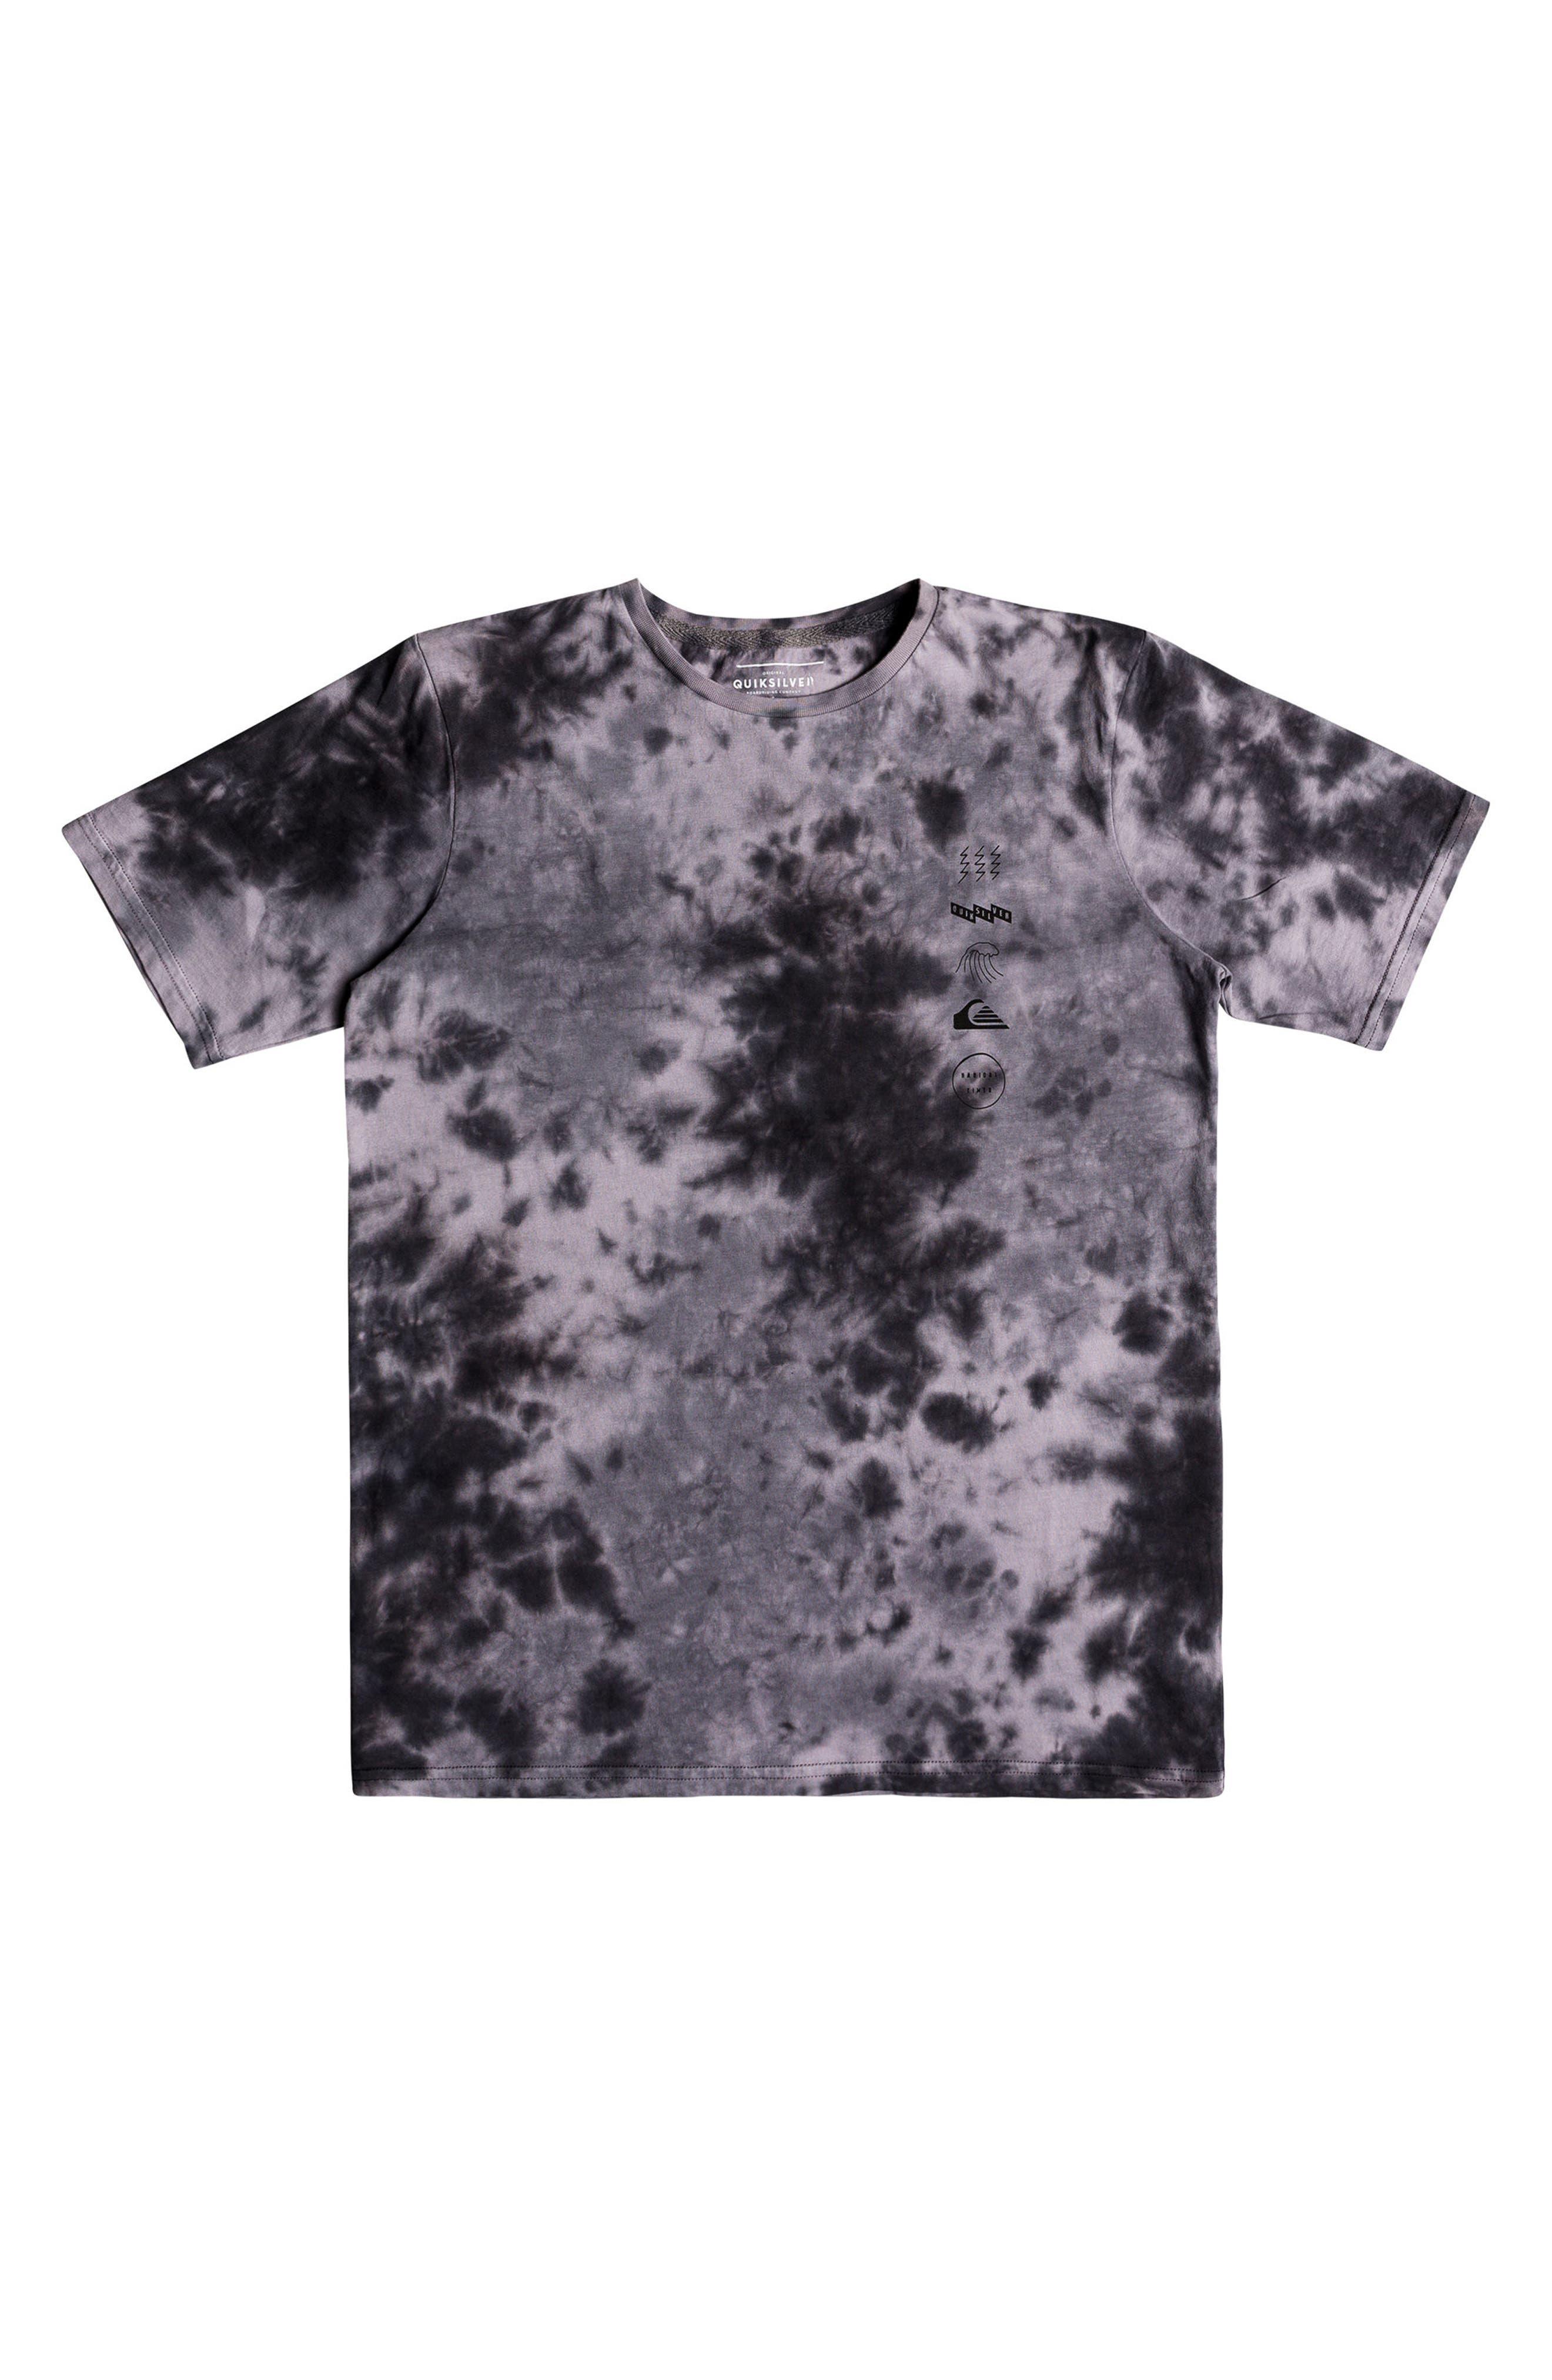 Gibus Moon Graphic T-Shirt,                             Main thumbnail 1, color,                             Iron Gate Tie Dye